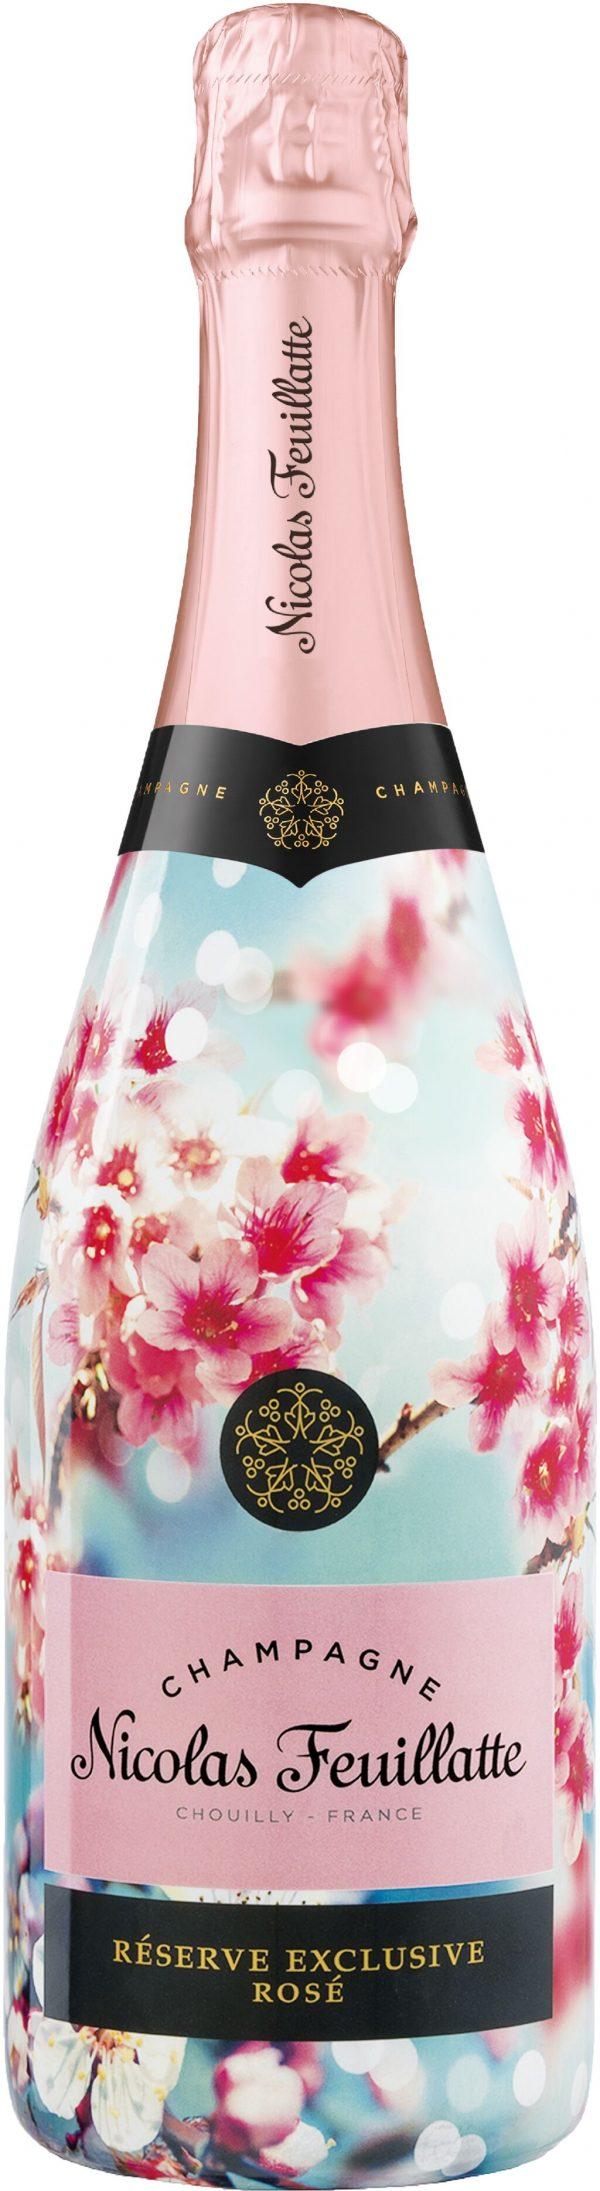 Nicolas Feuillatte Reserve Exclusive Rose Sleeve 75cl